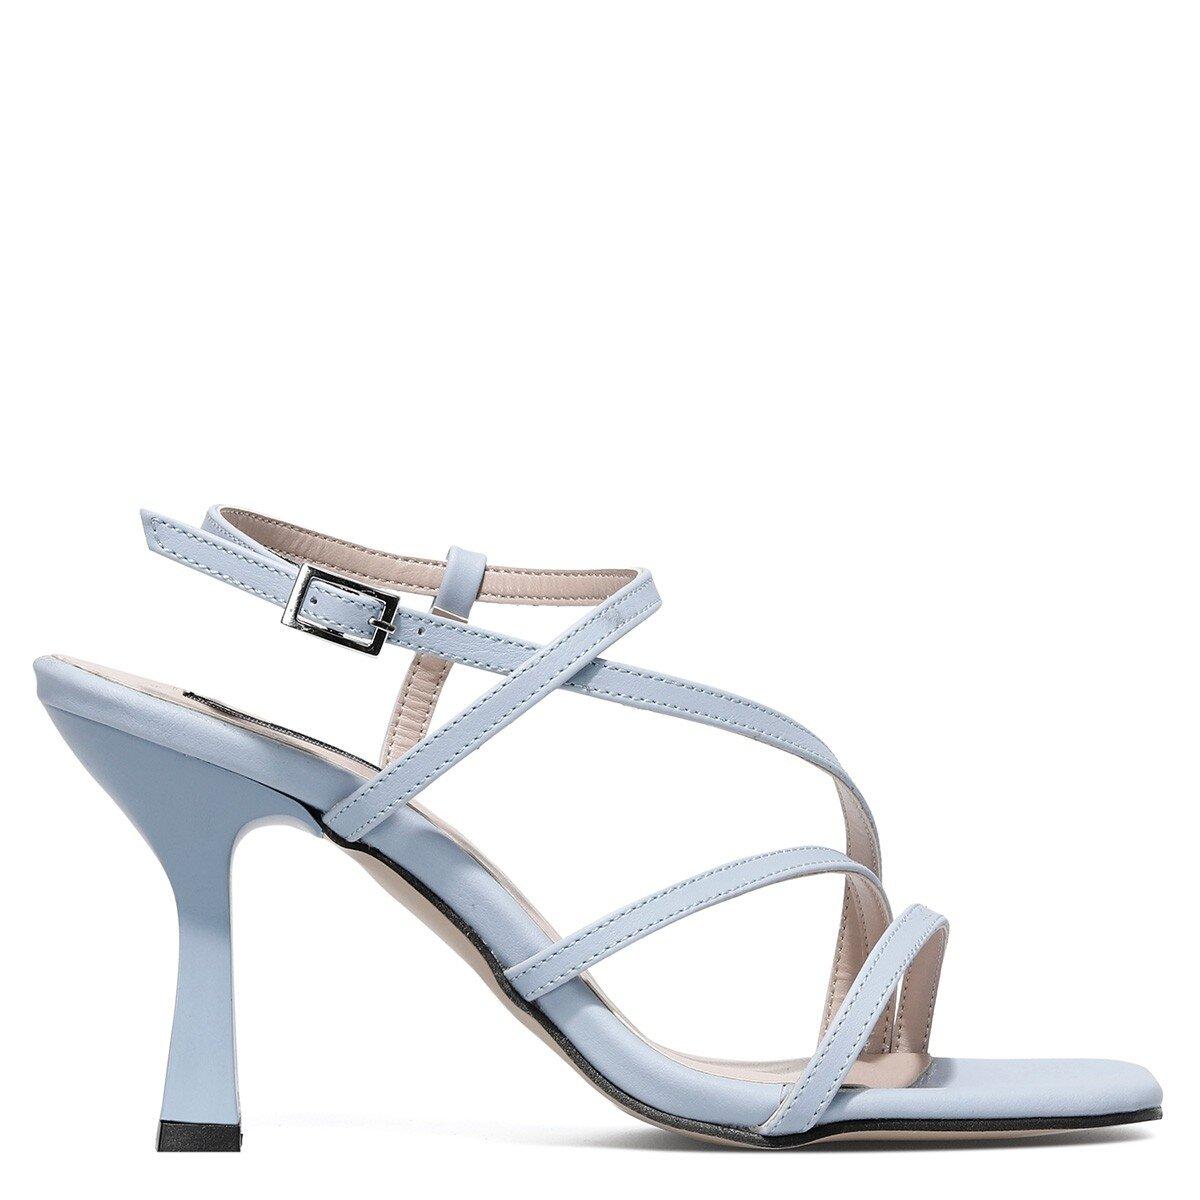 RIA 1FX Mavi Kadın Topuklu Sandalet